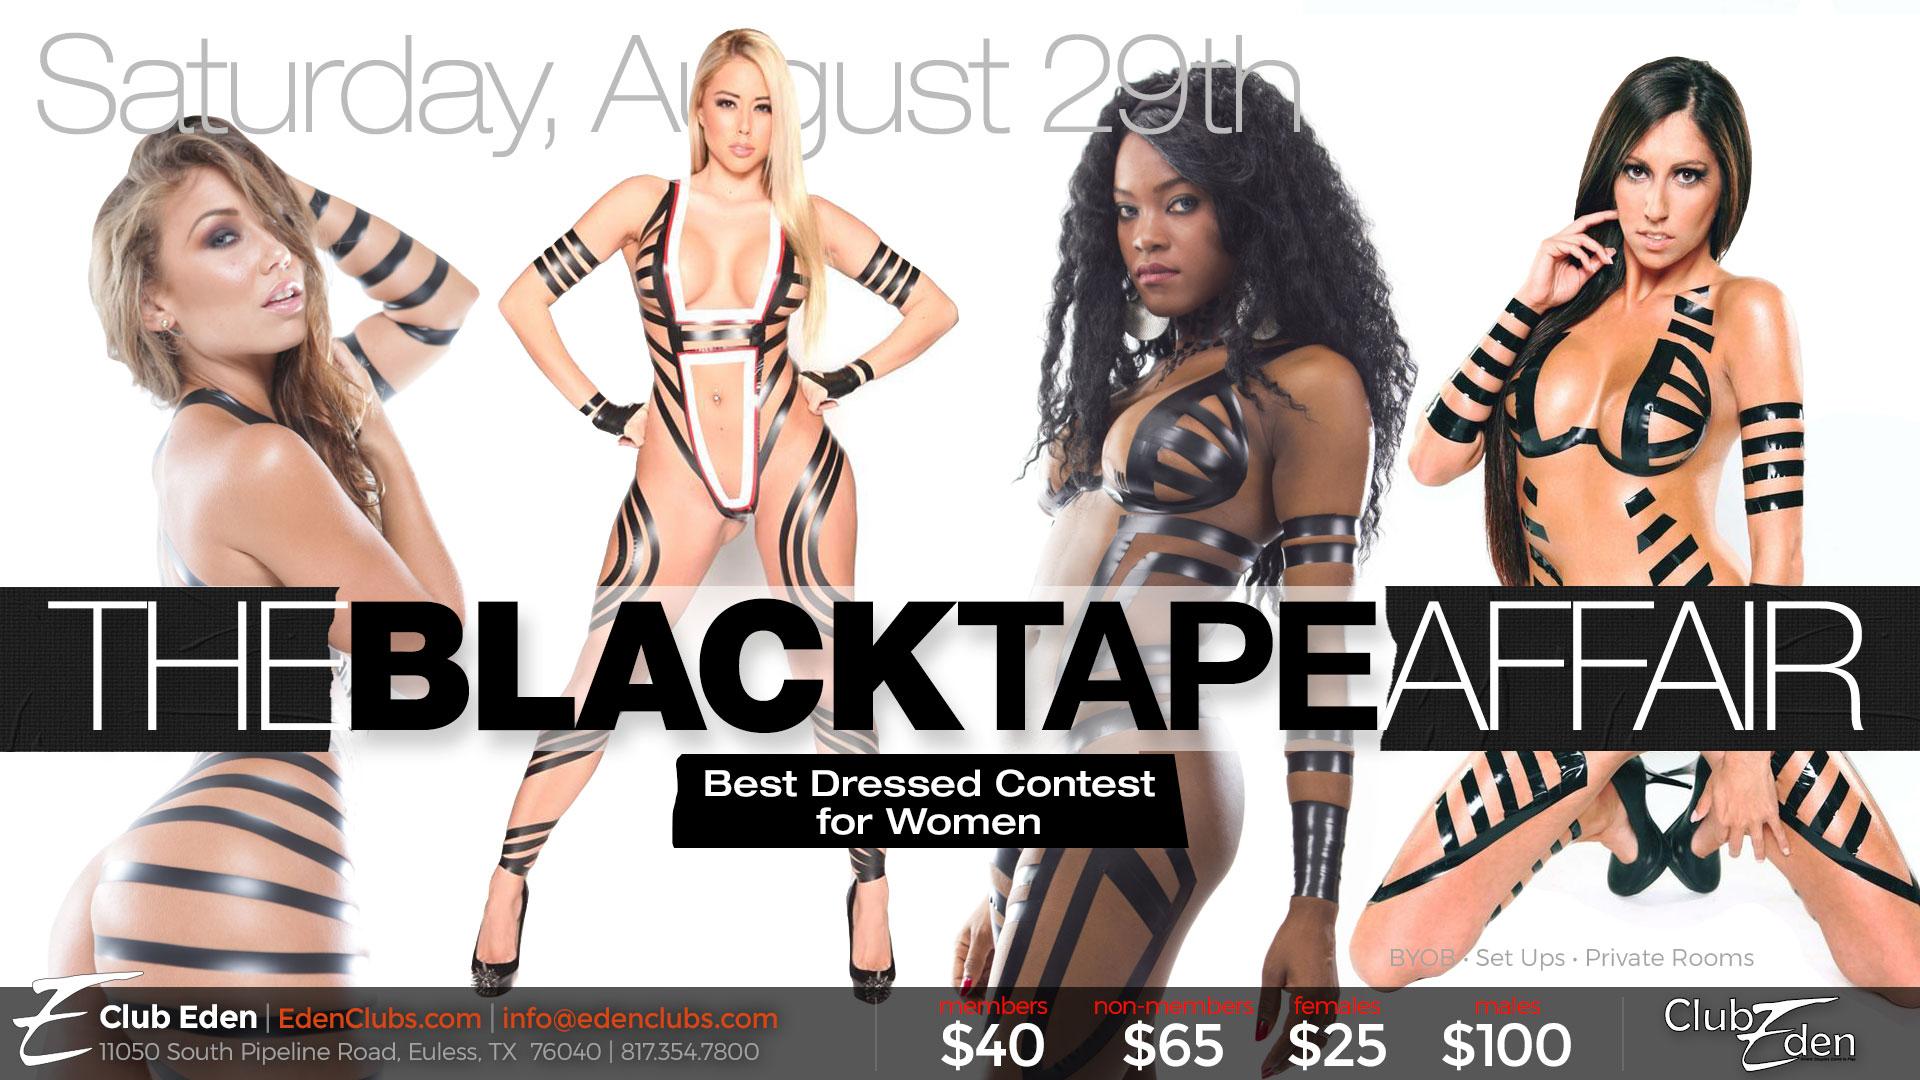 082920-Black-Tape-tv